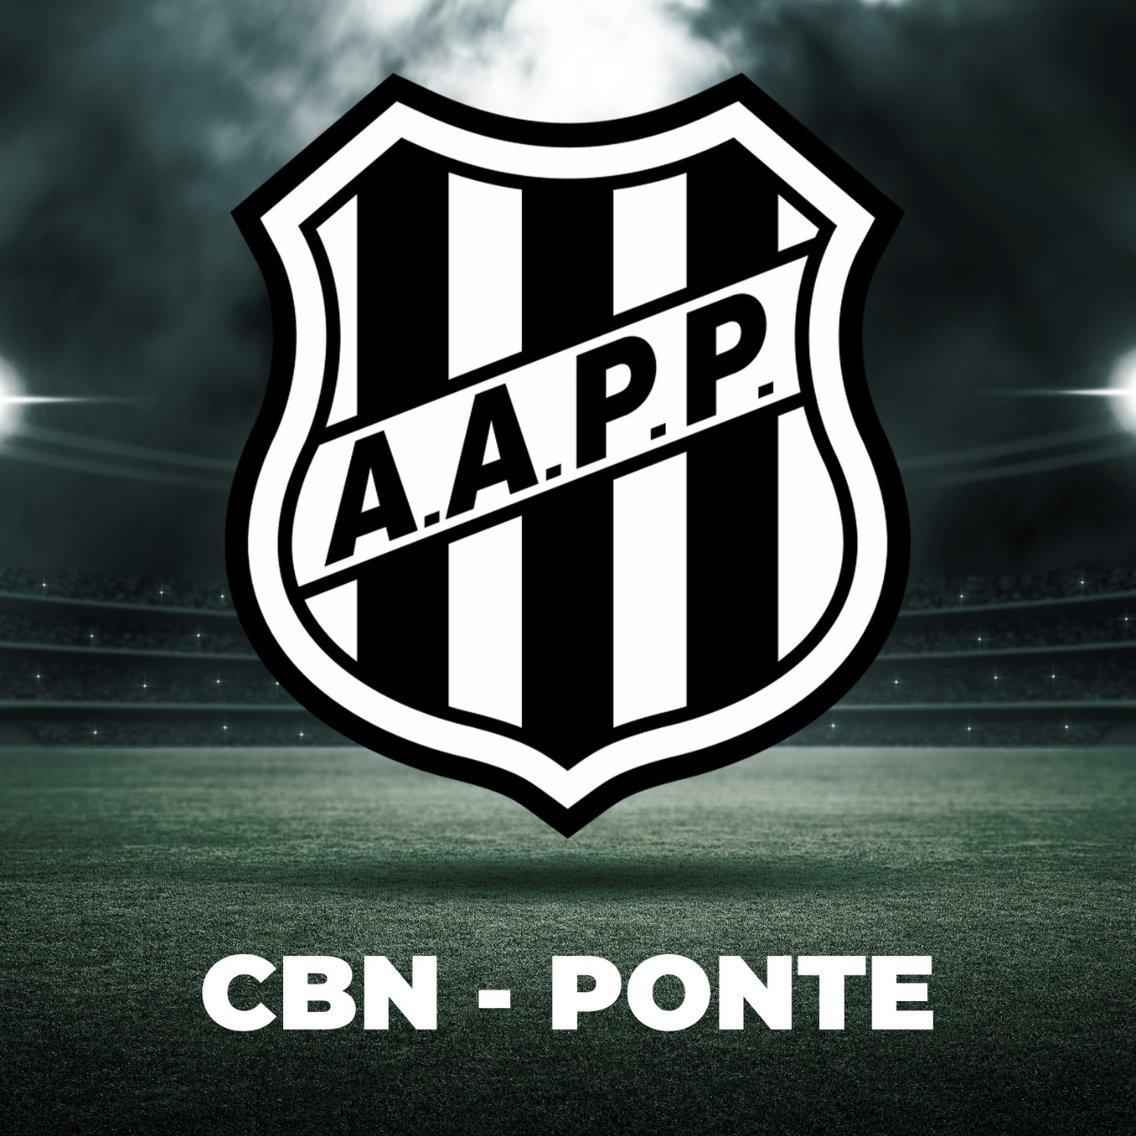 CBN - Ponte - Cover Image